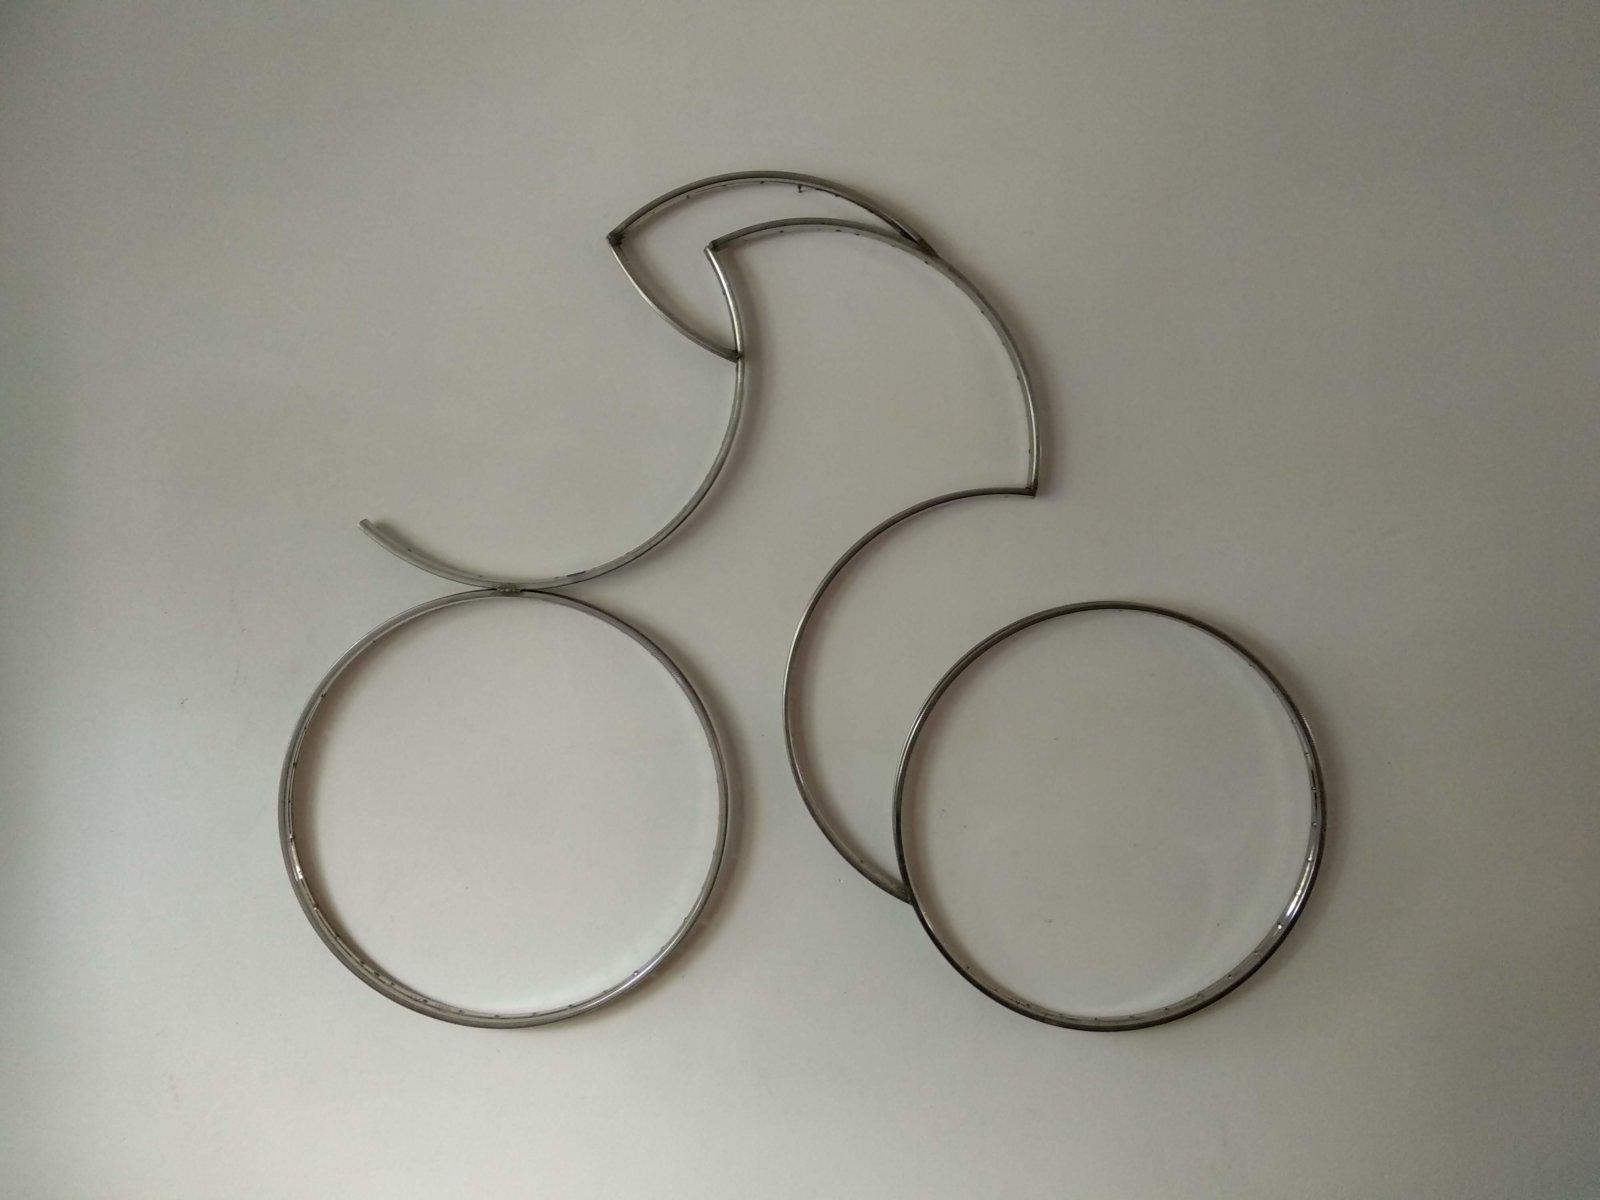 Metal Sculpture Time Trial Cyclist Decreatievelink